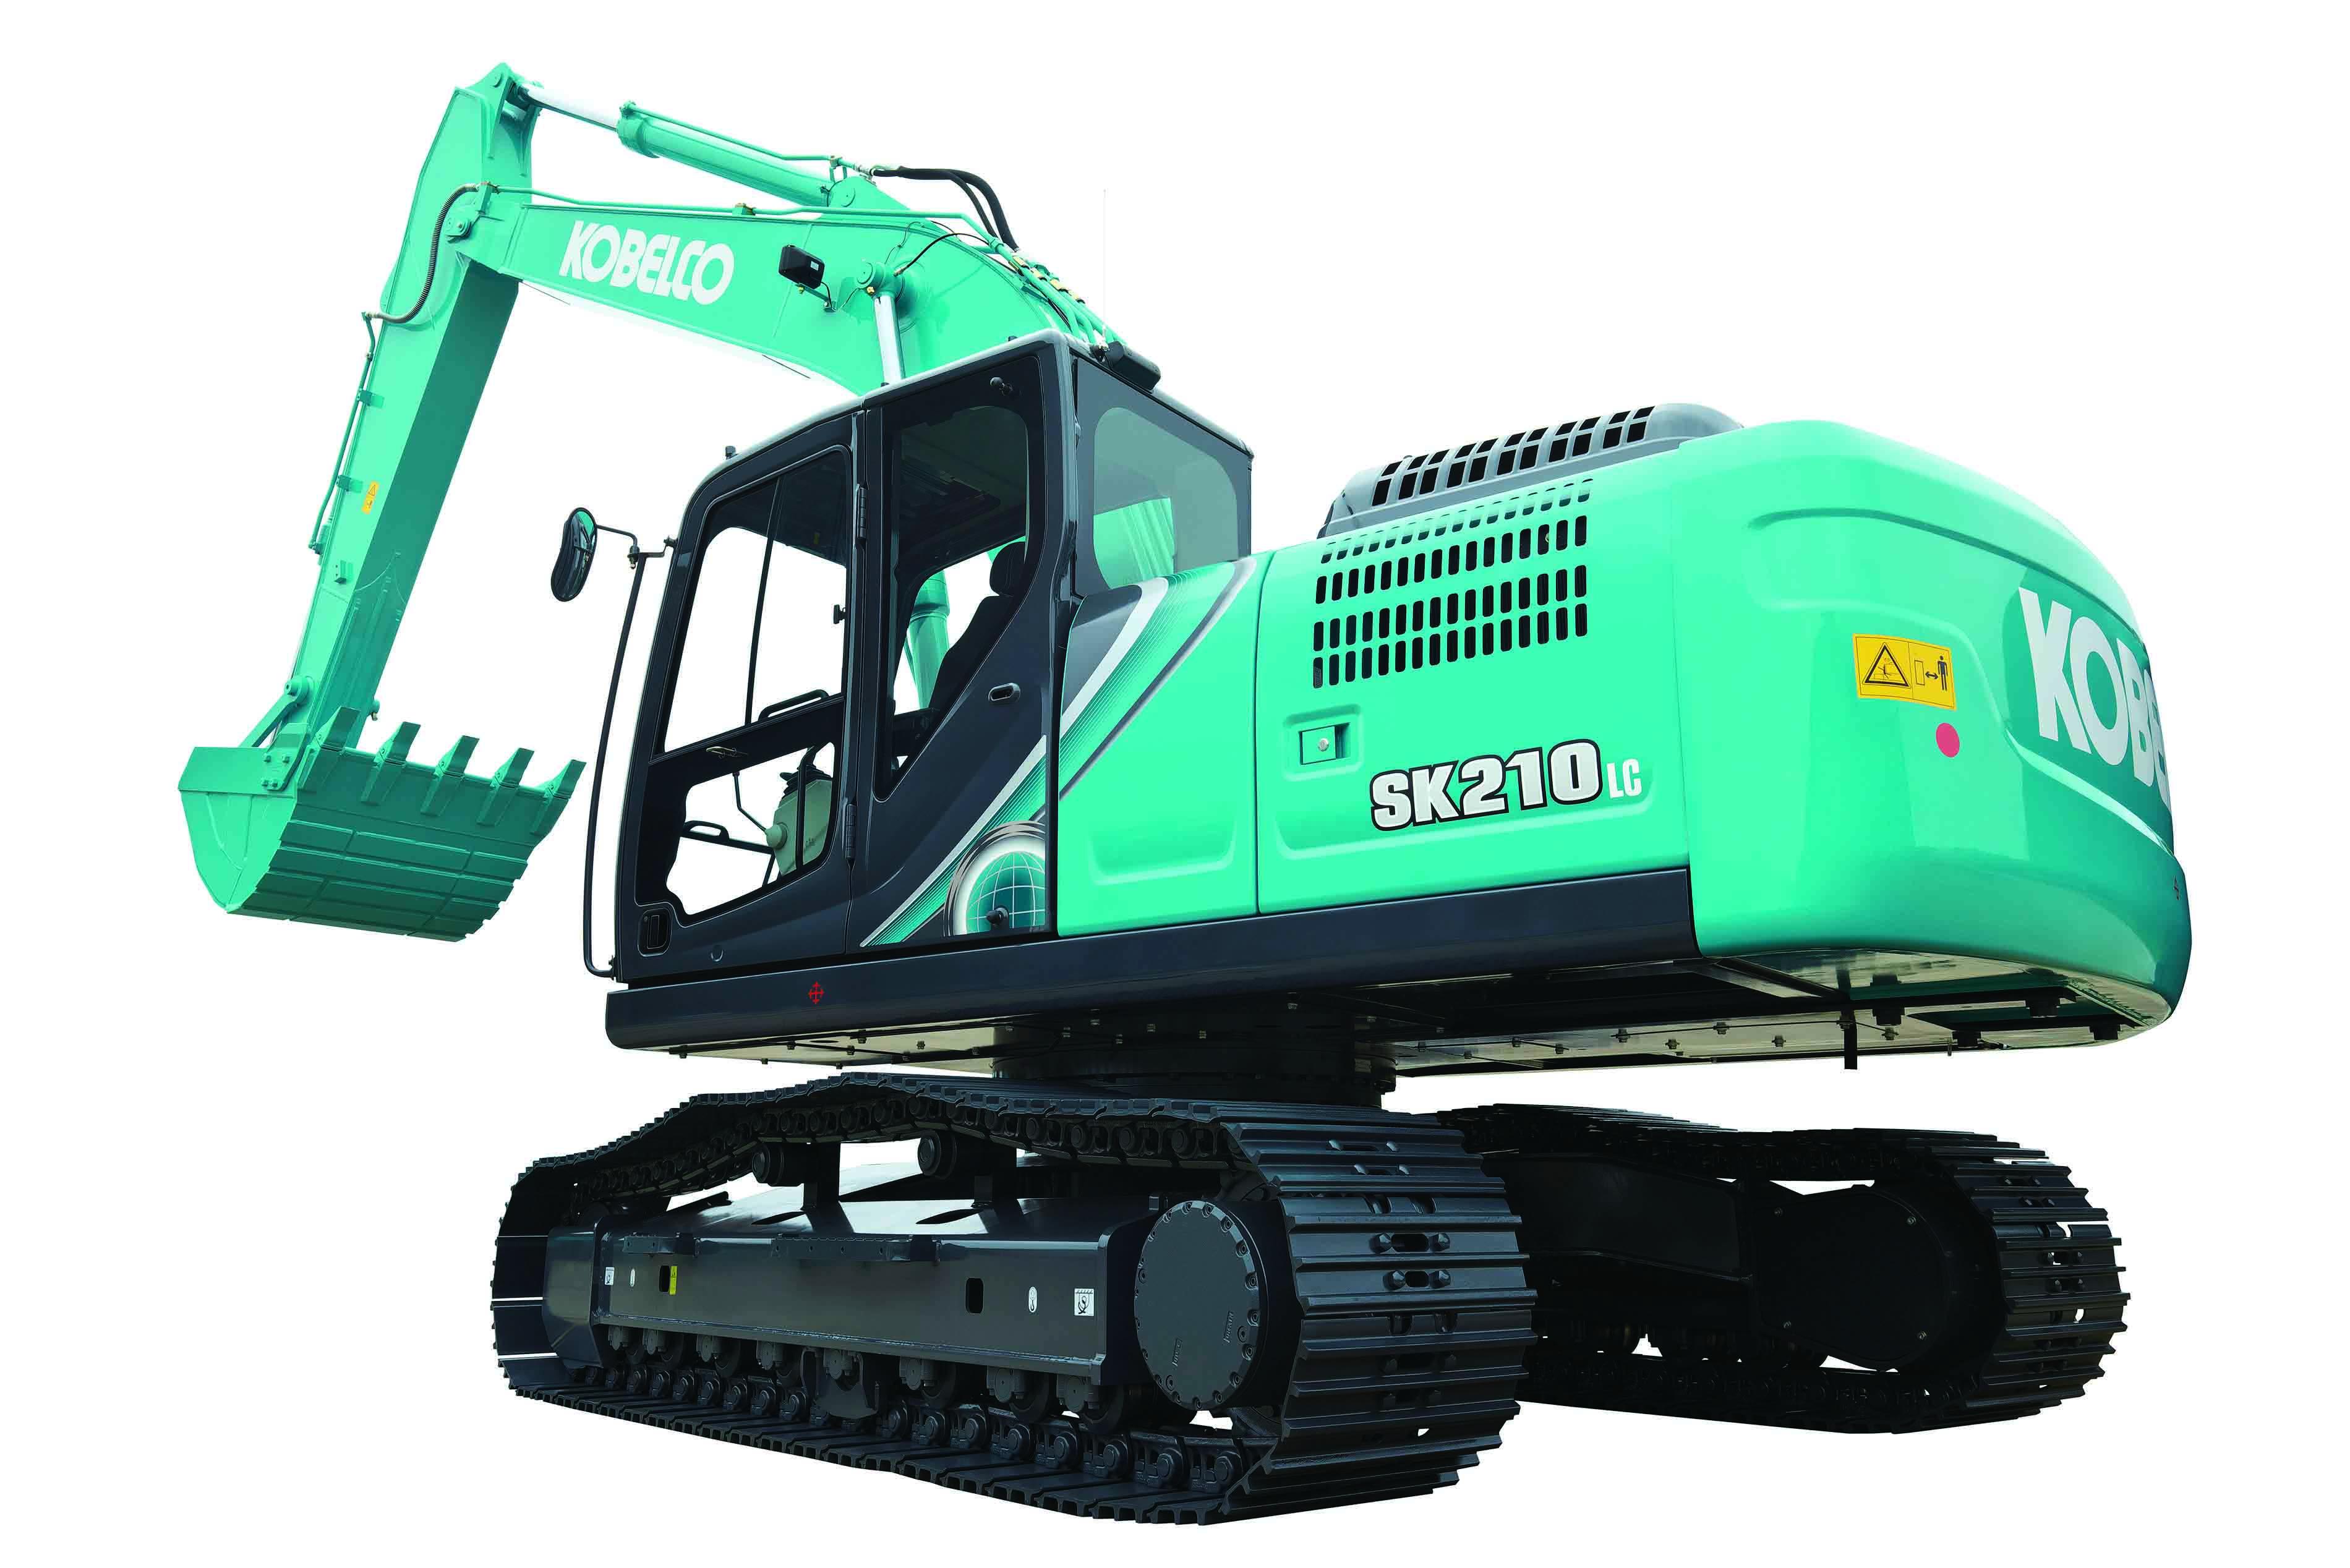 Kobelco Sk 210 Lc 10 Excavator Specs 2015 2019 Diggers Lectura Specs